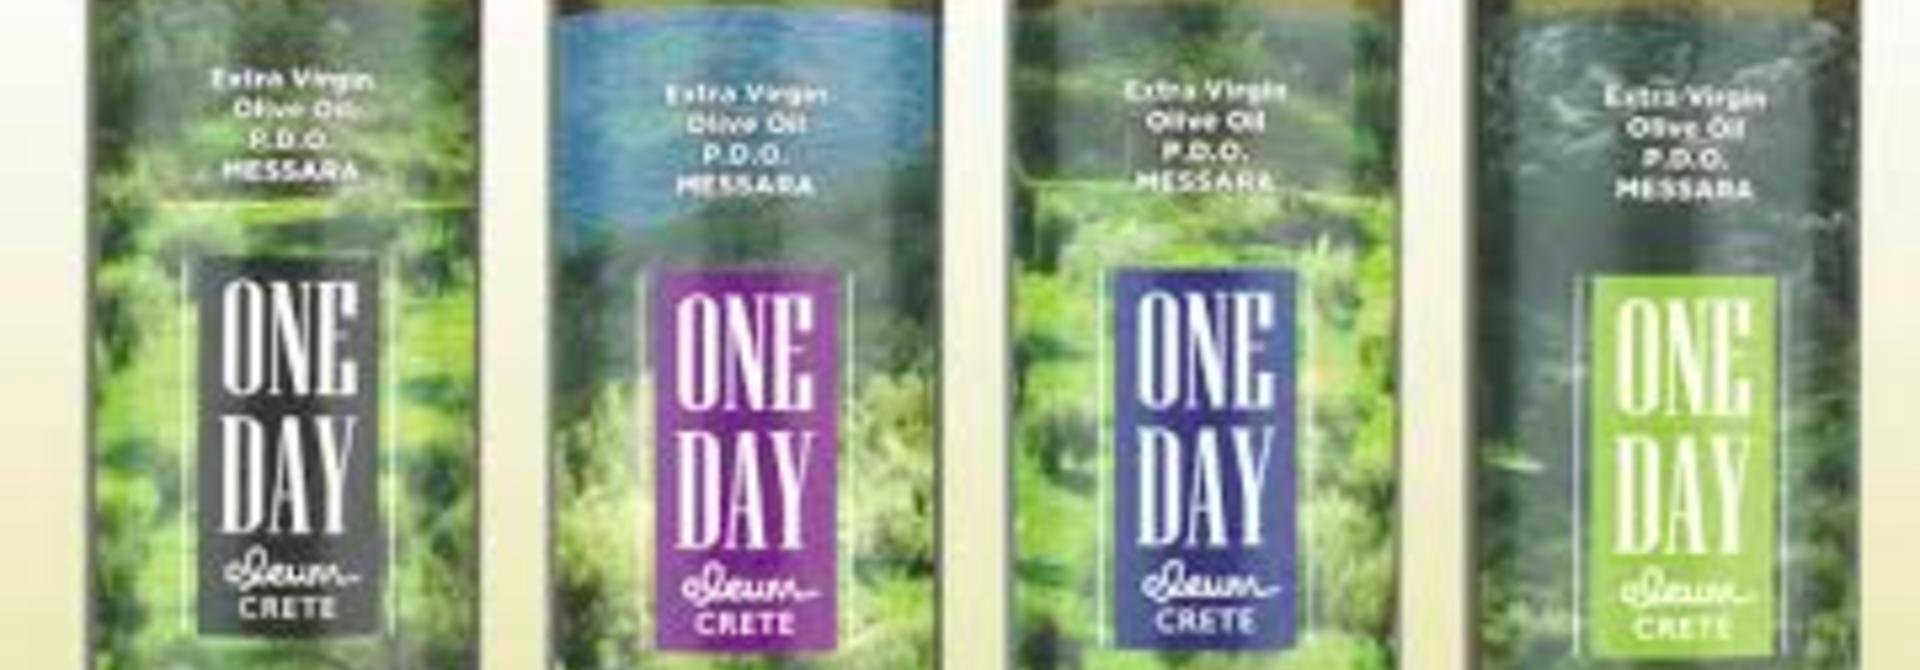 One Day Extra Virgin olijfolie Kydonakis 500ml glas